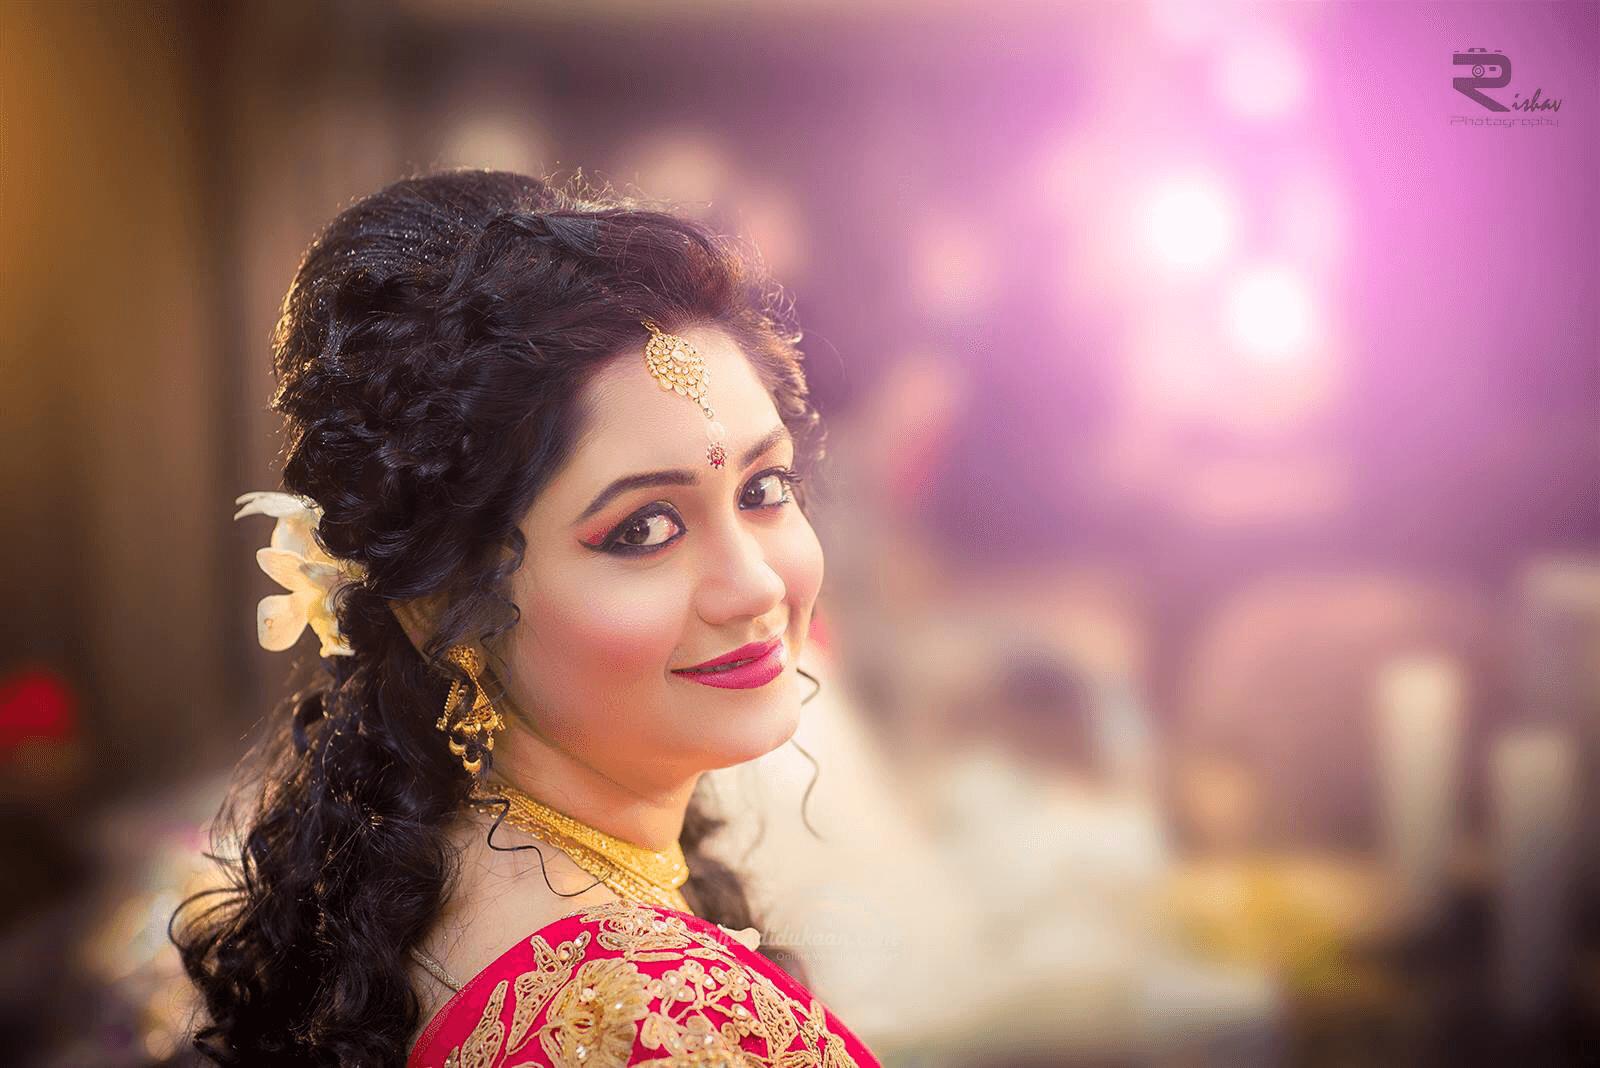 Rishav Photography